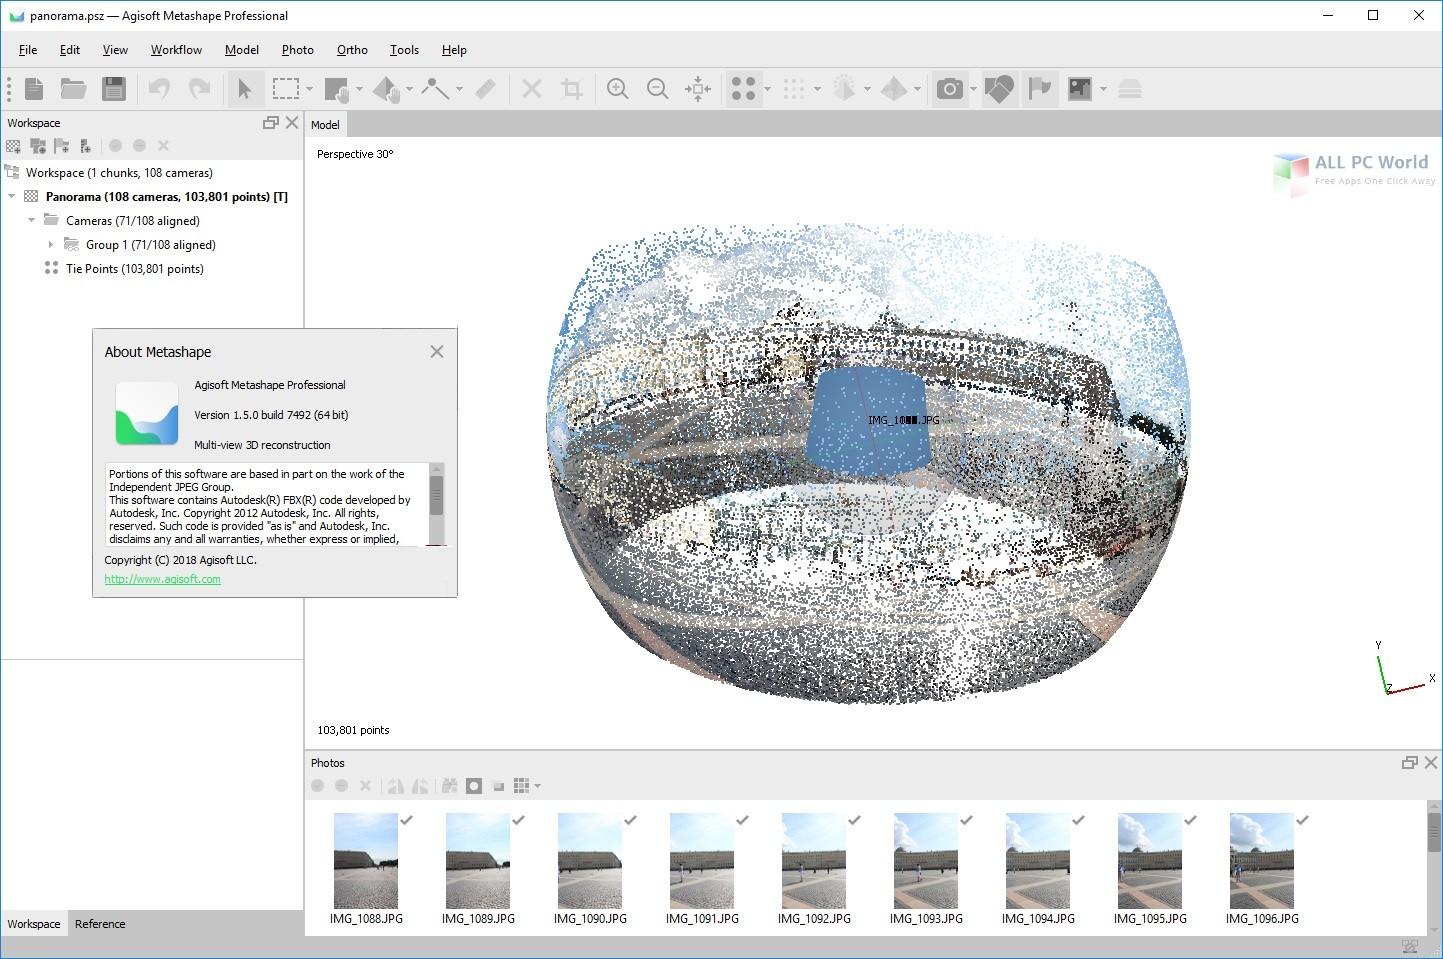 Agisoft Metashape Professional 1.5